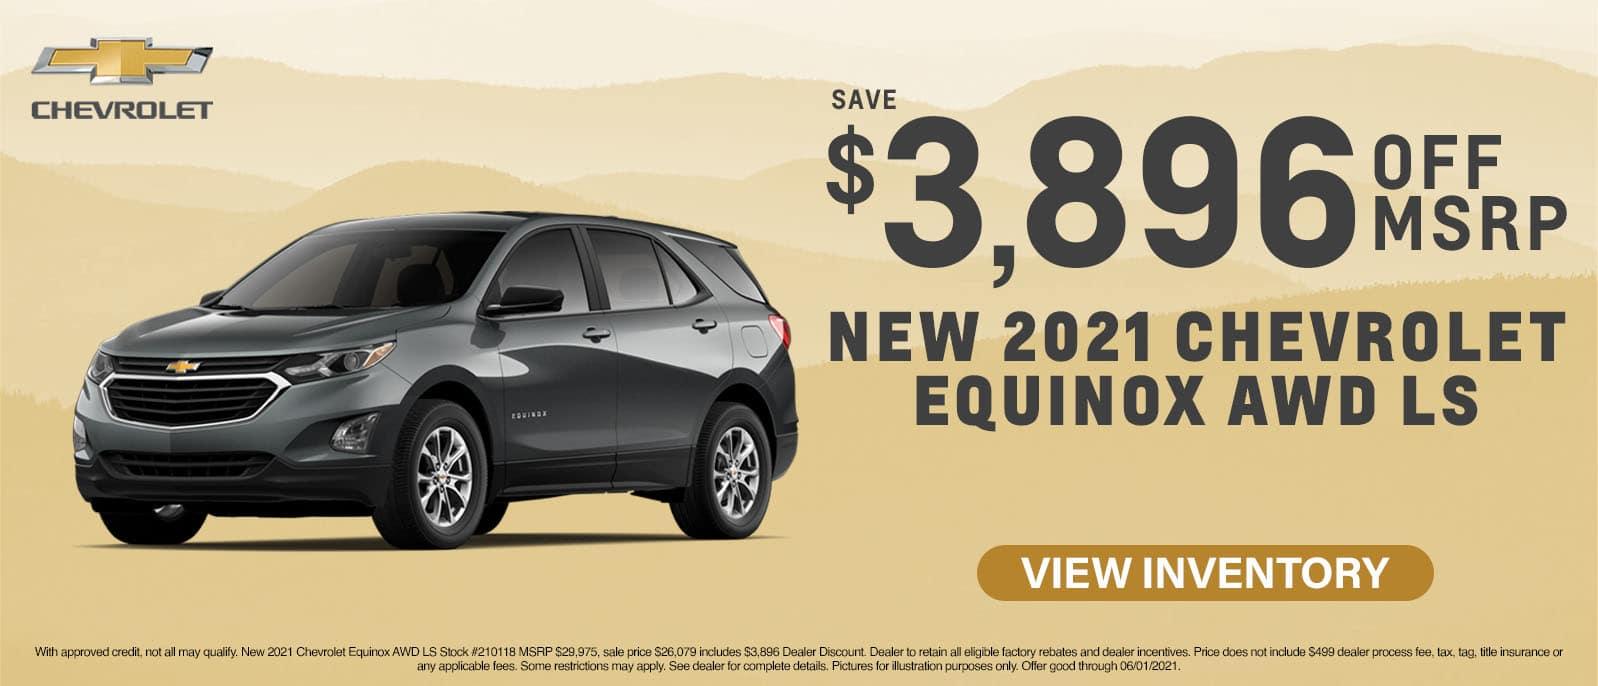 CRCH-May 2021-2021 Chevrolet Equinox